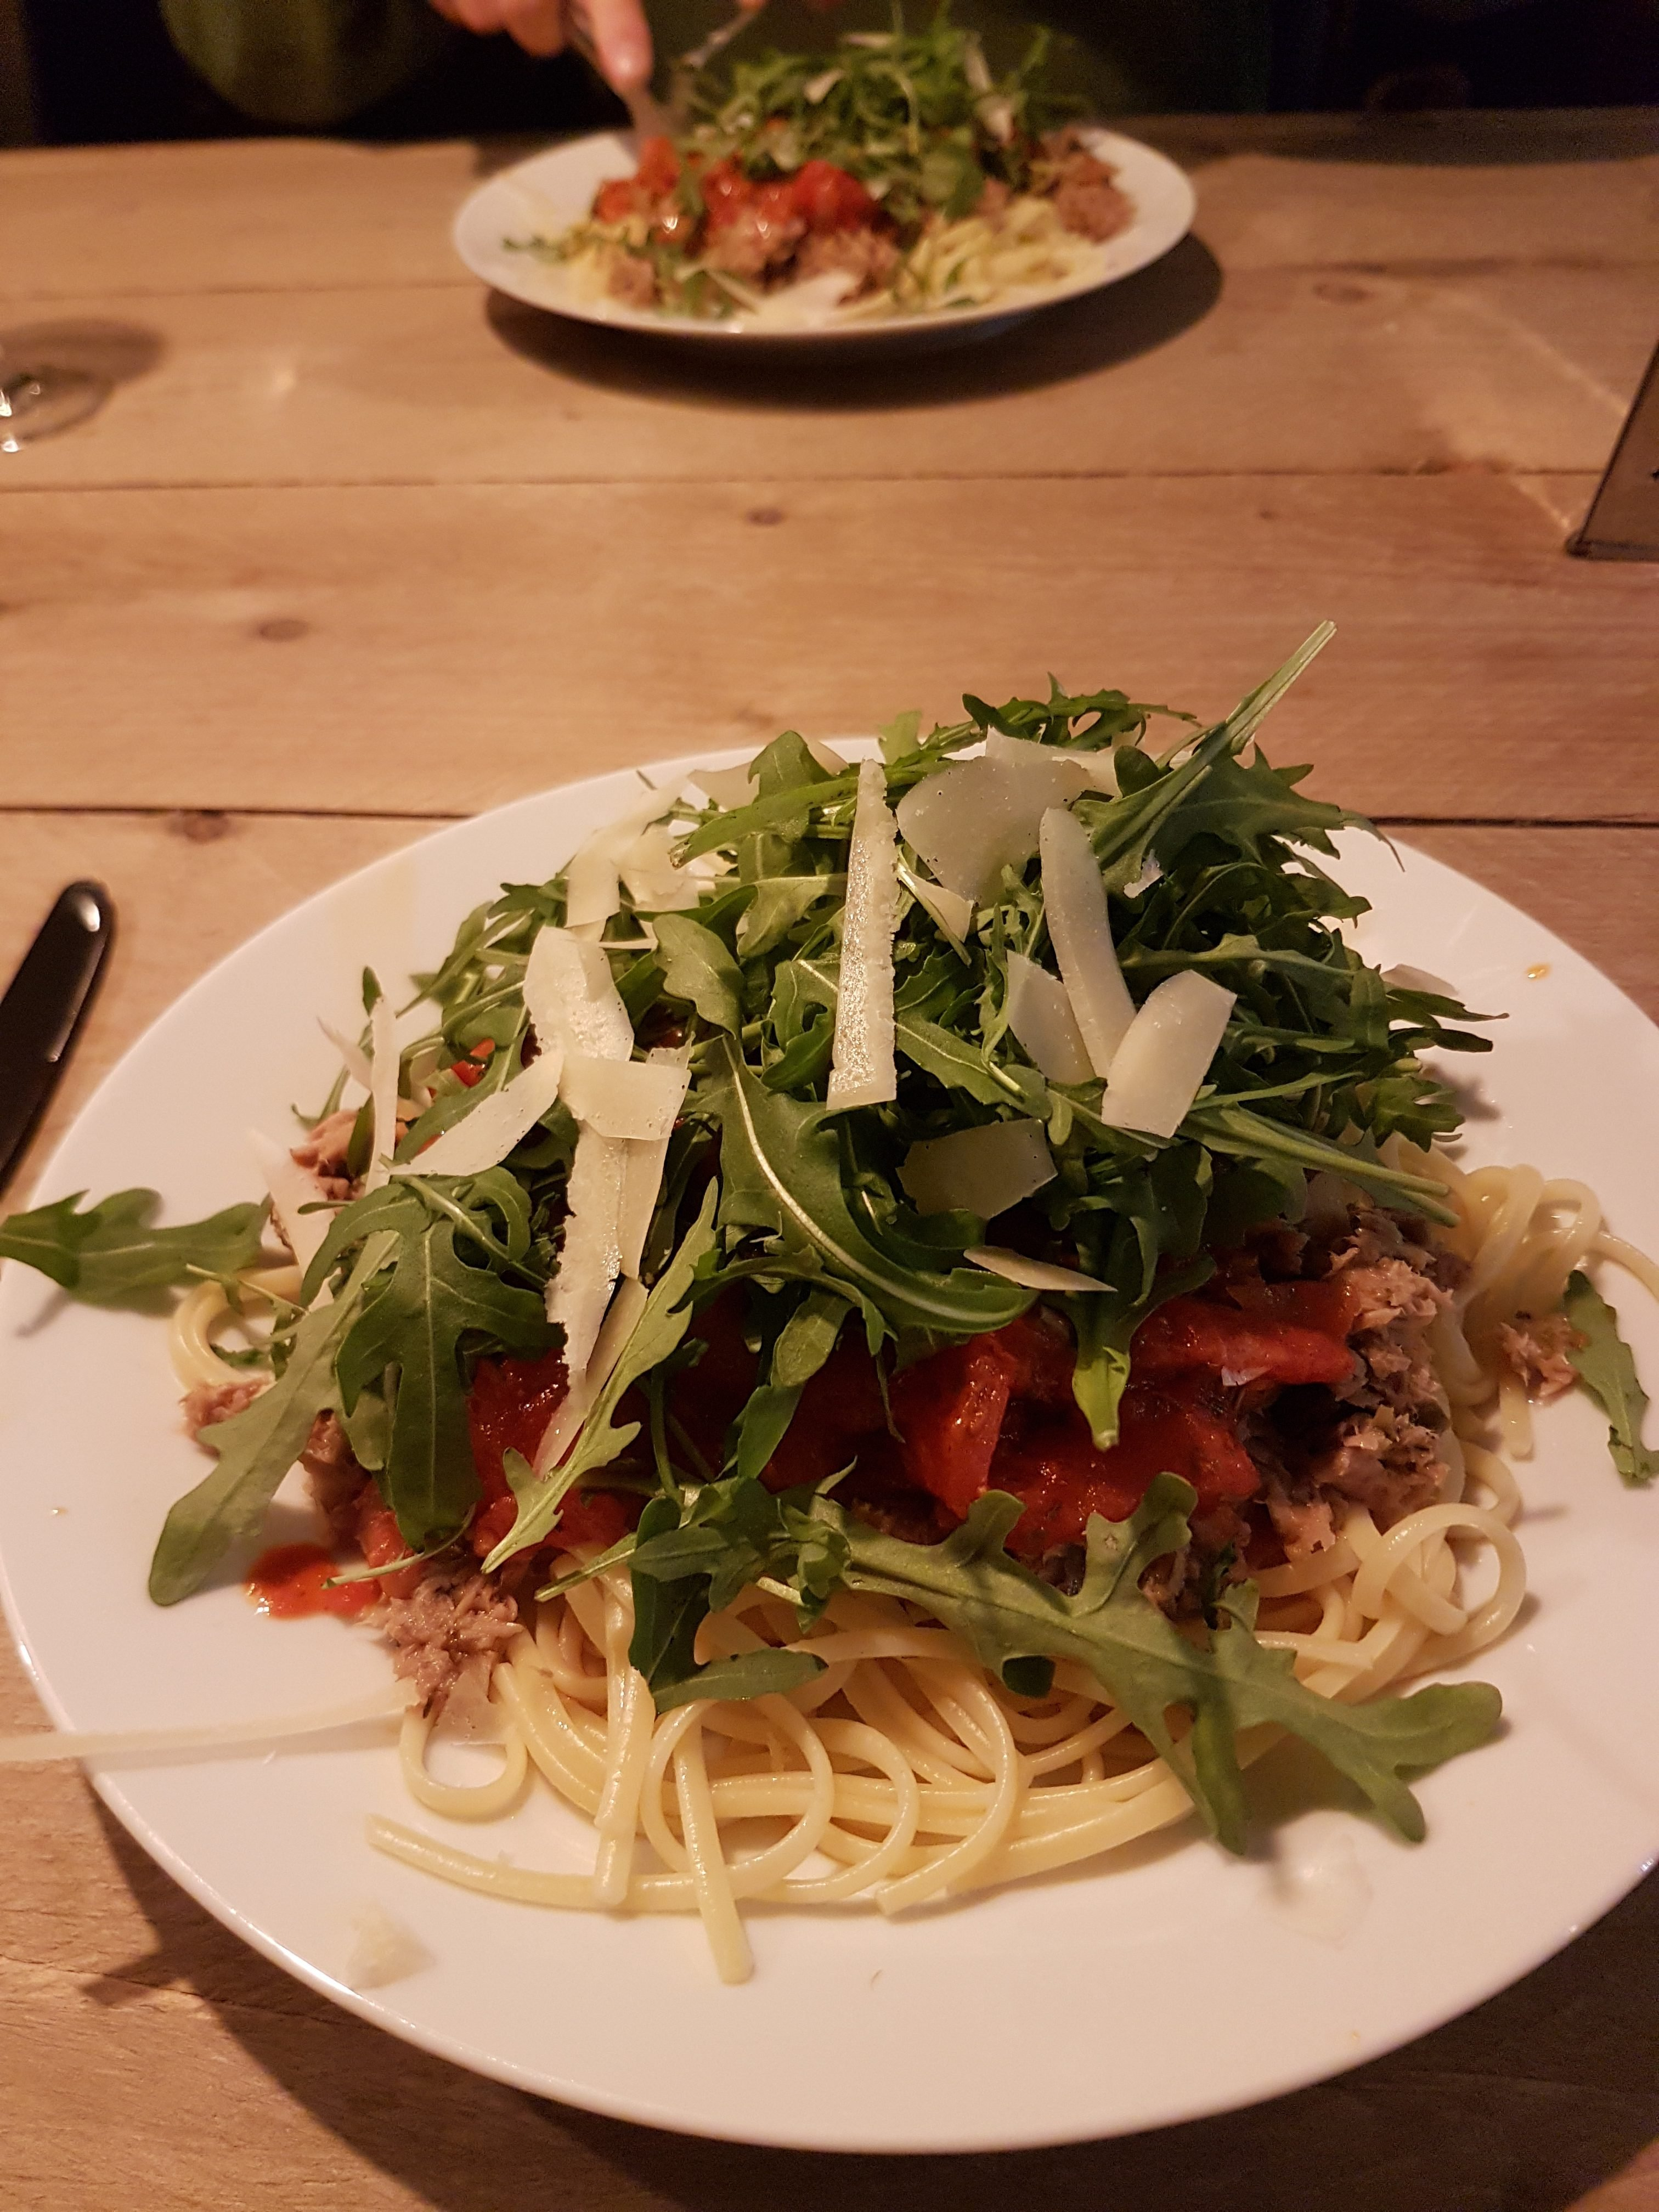 tonijnsaus pasta